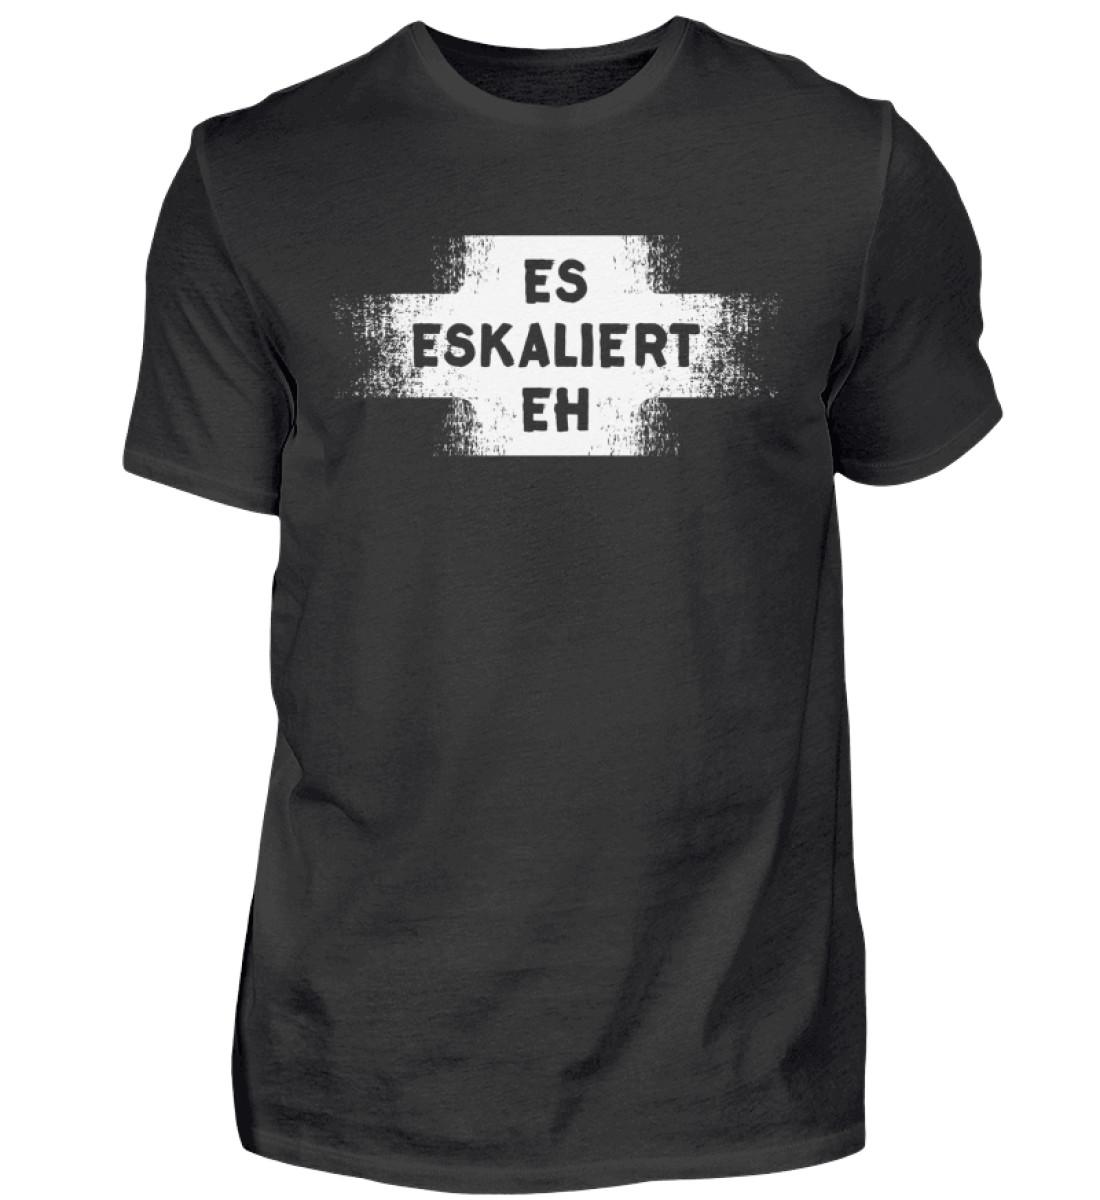 Es eskaliert eh - Herren Shirt-16